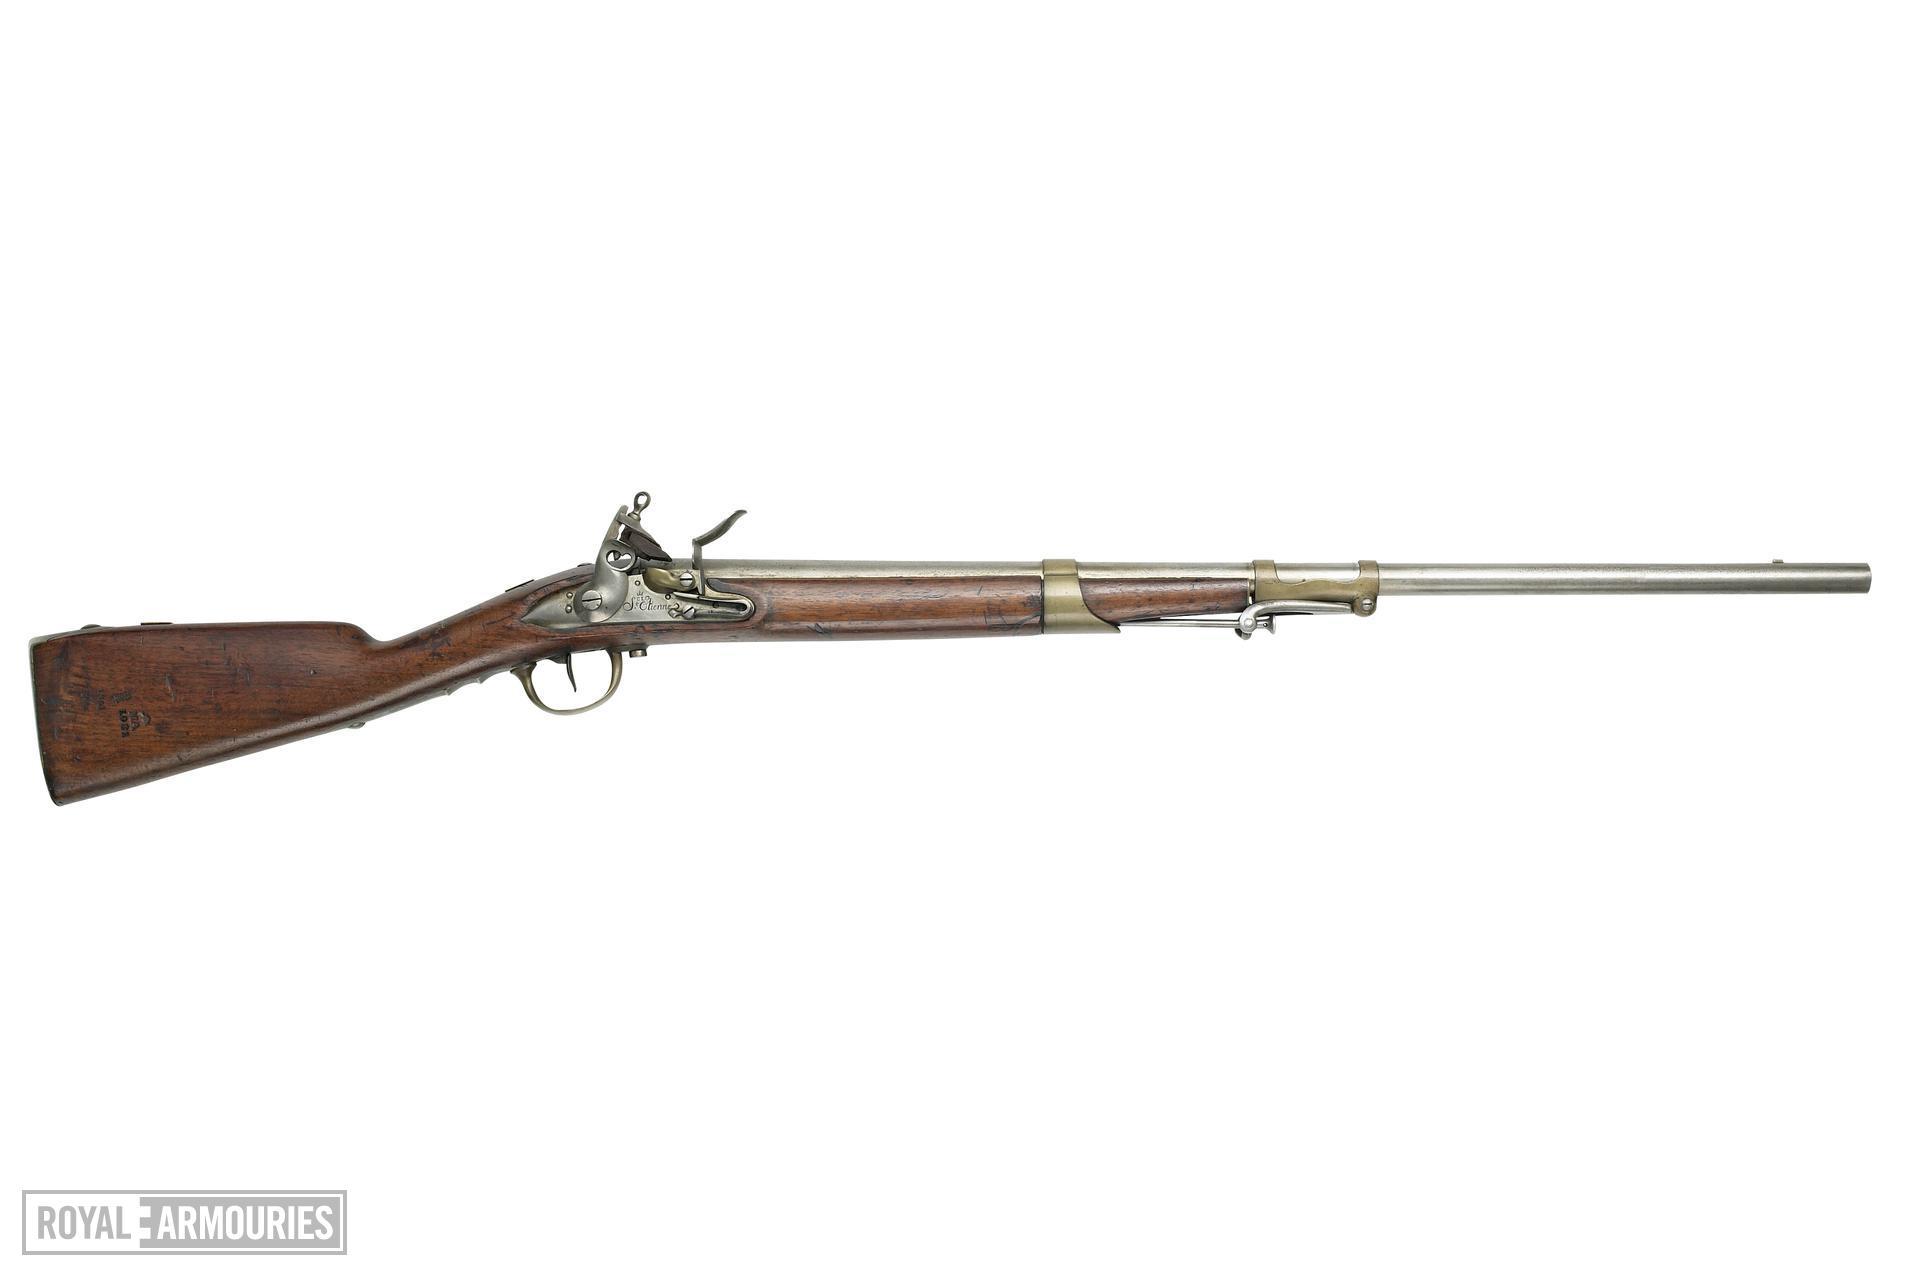 Flintlock military carbine - Model 1781